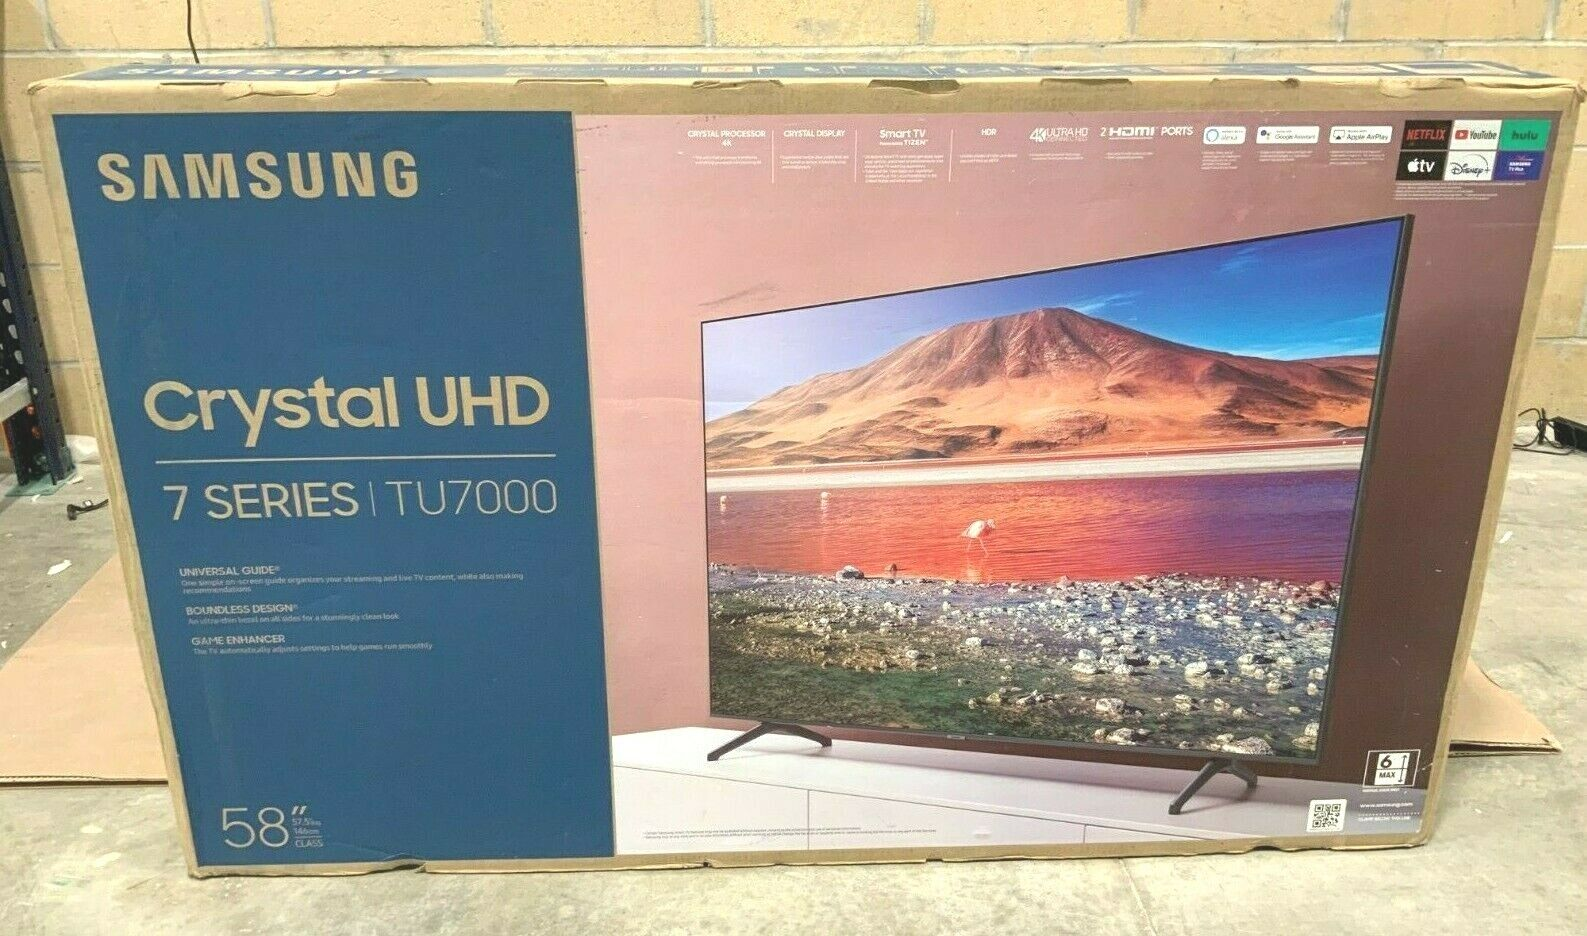 Samsung TU7000 58 LED LCD Smart TV (4K) UN58TU7000FXZA 2020 Model NOB ✅❤️️. Available Now for 379.99